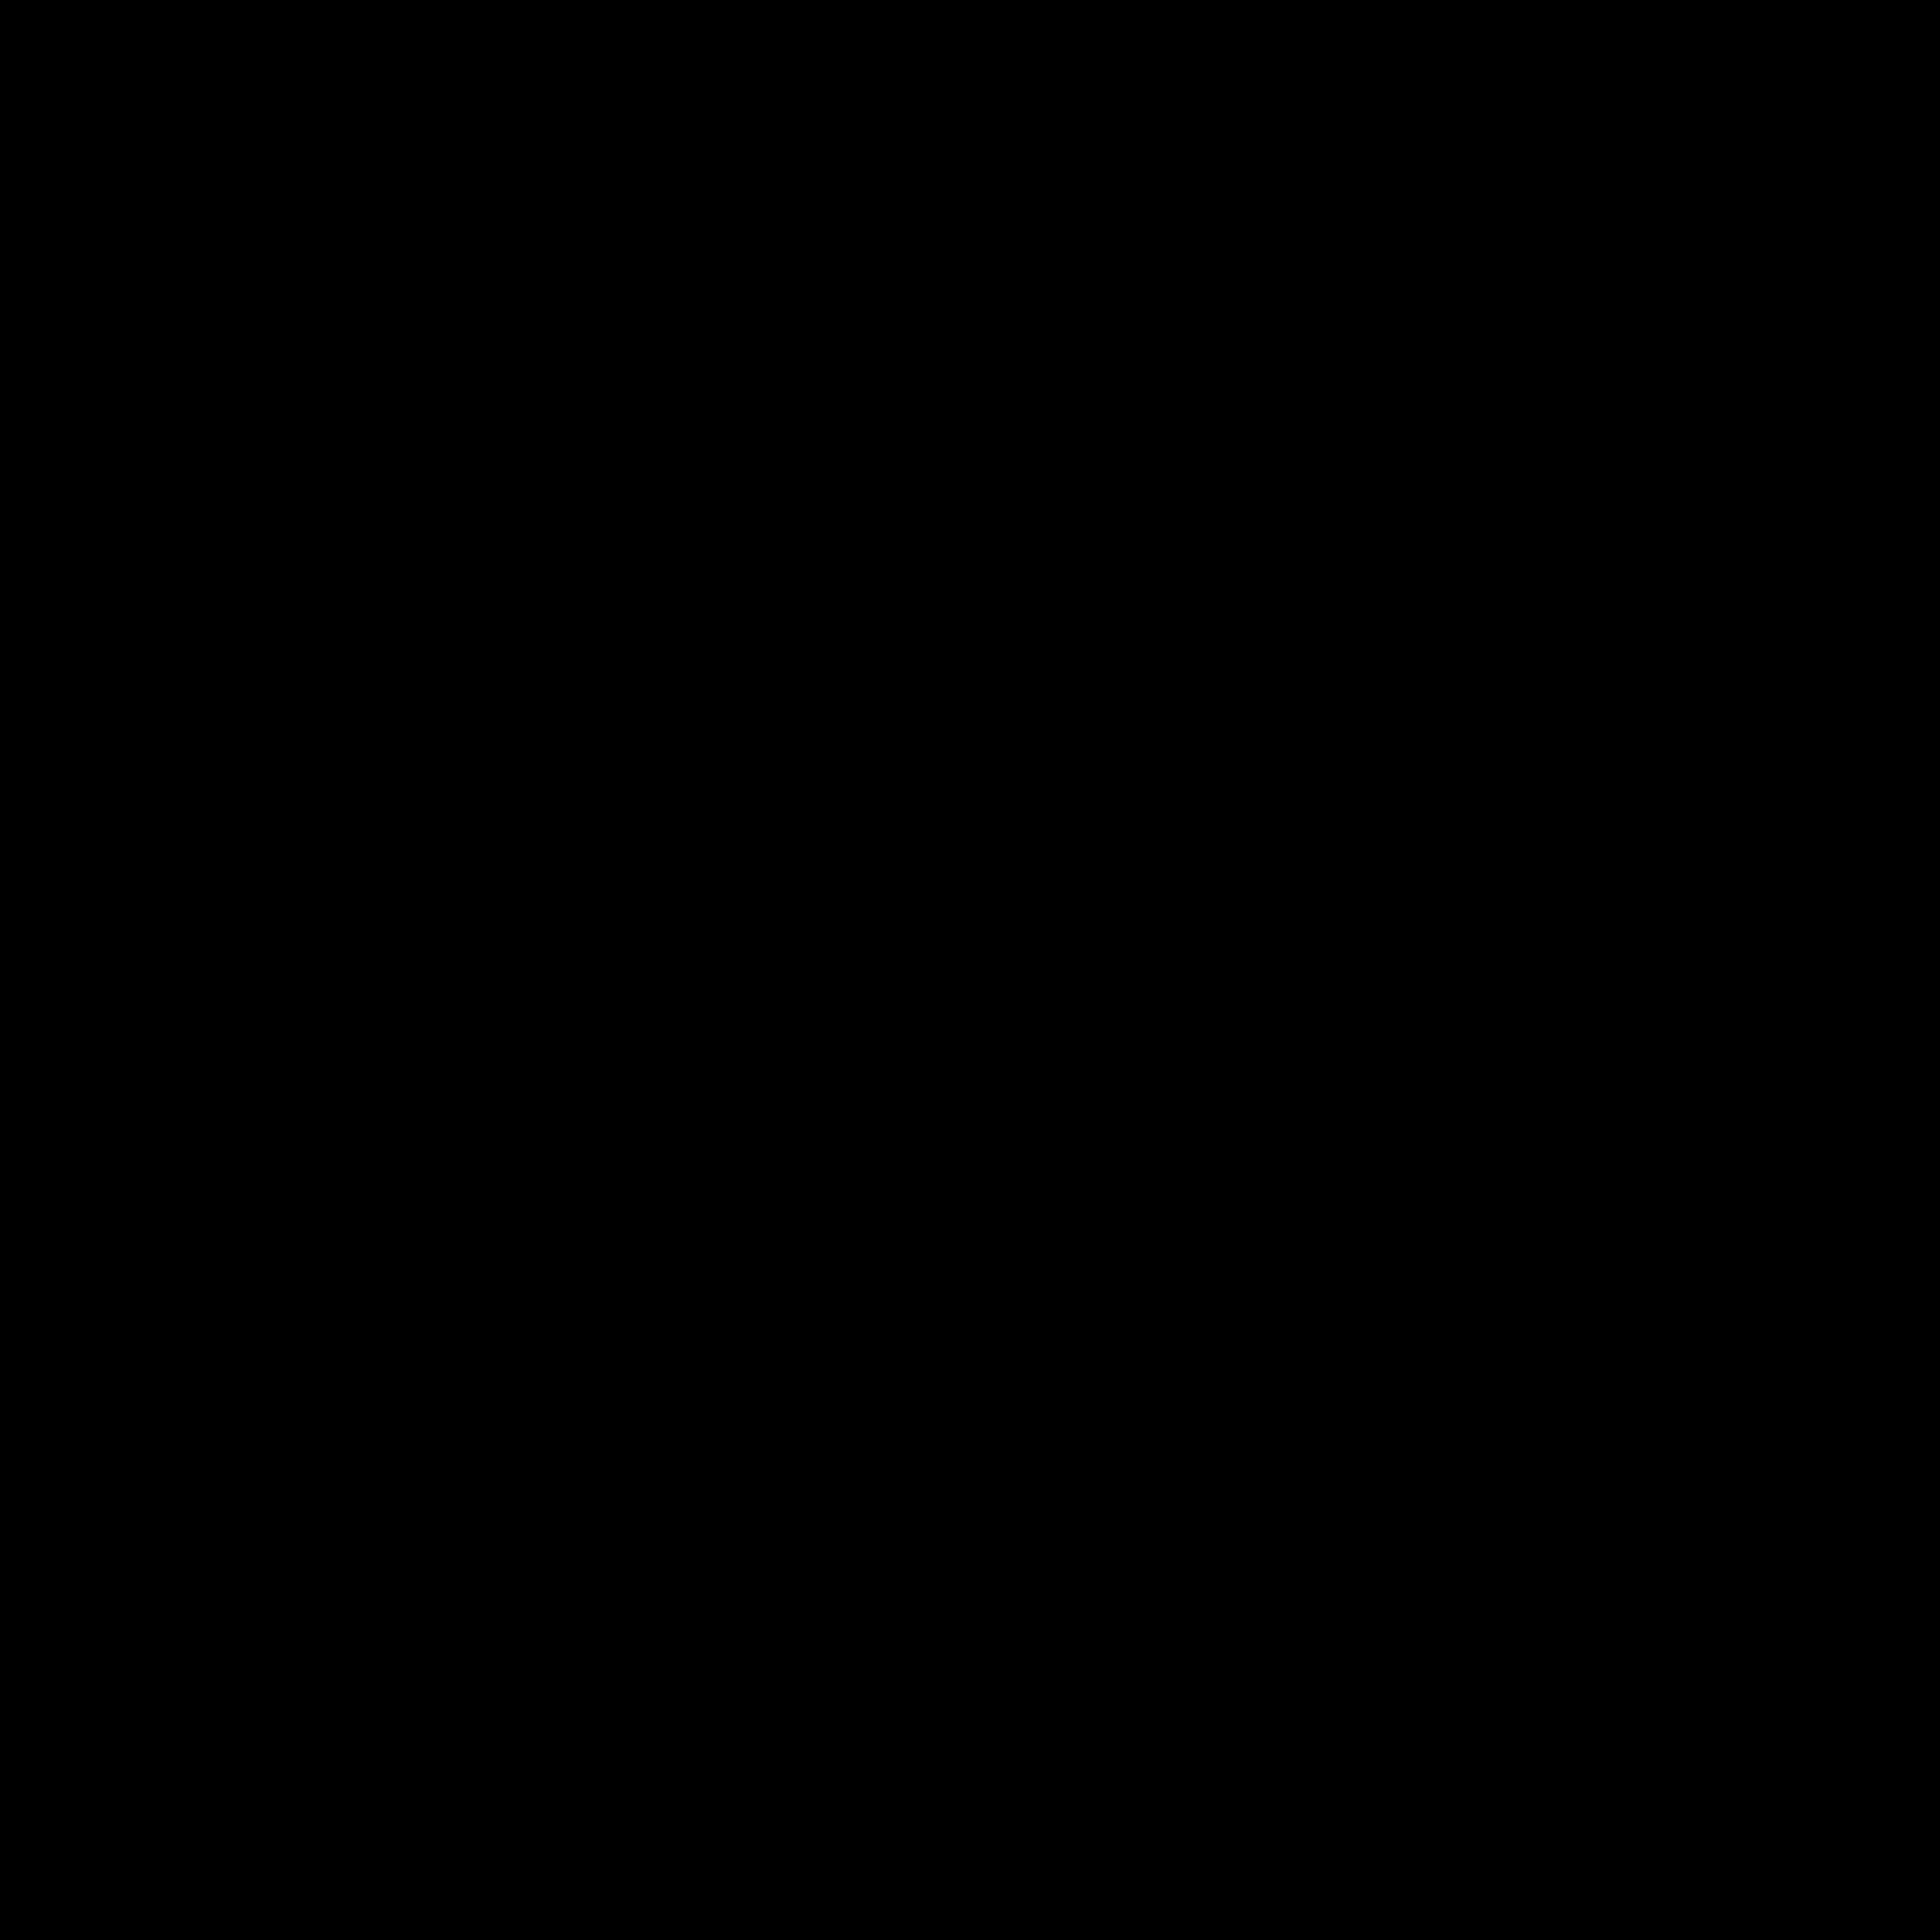 Klappsekrektär aus dem 19. Jahrhundert